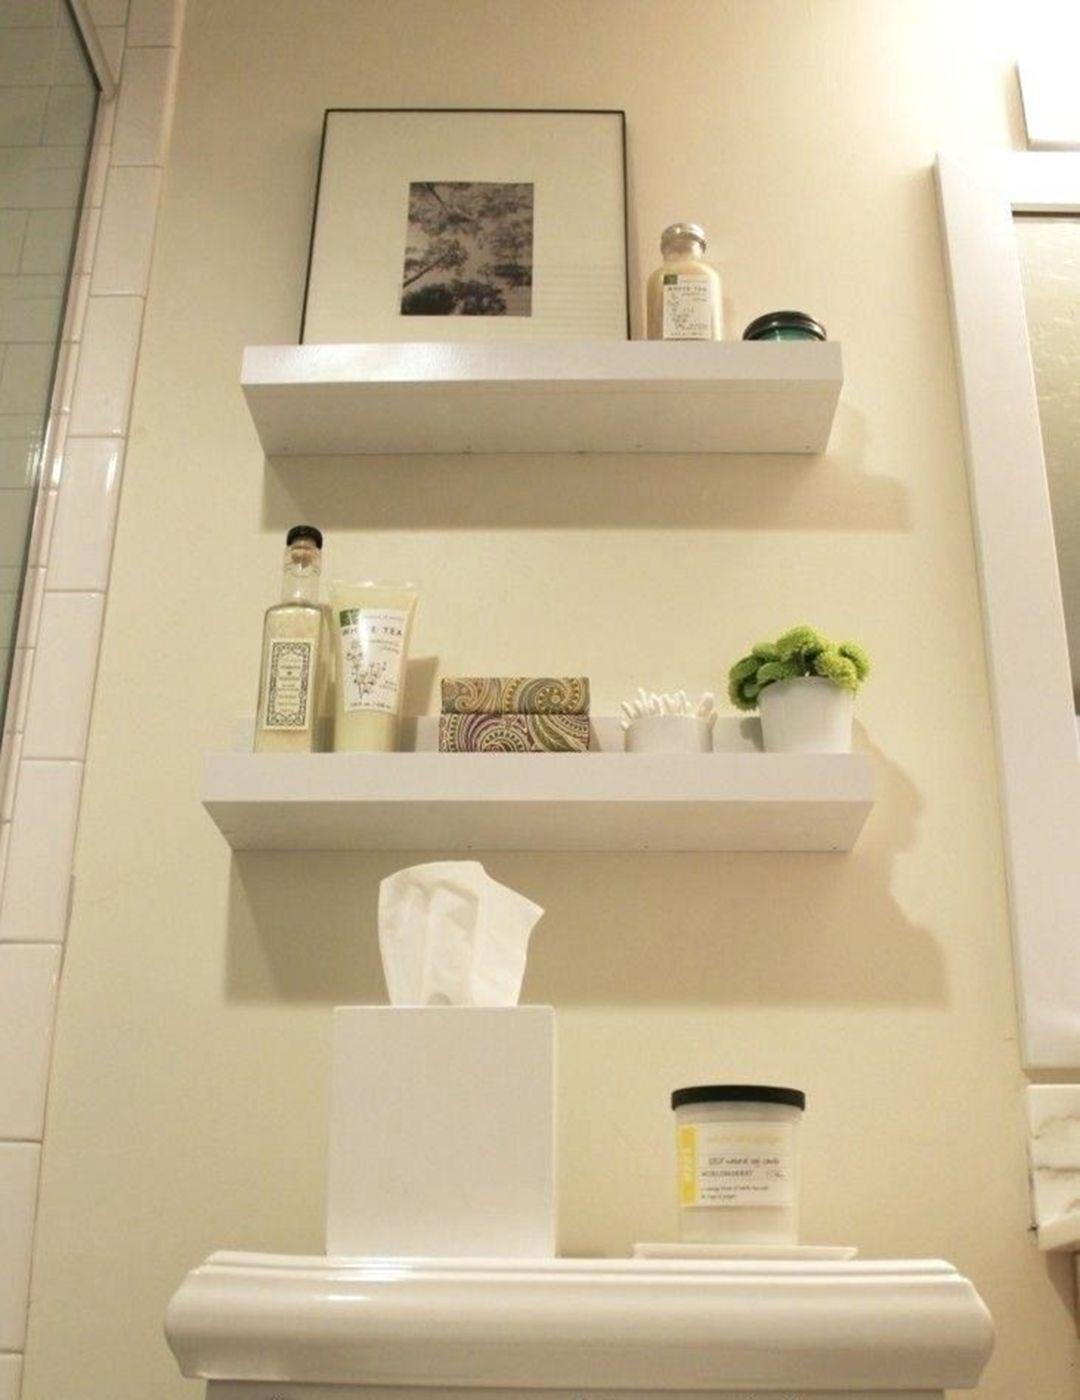 15 Interesting Floating Wall Shelves For Your Bathroom Style Ideas Design Decorating Bathroom Wall Shelves Shelves Above Toilet Diy Bathroom Storage Small bathroom wall shelf